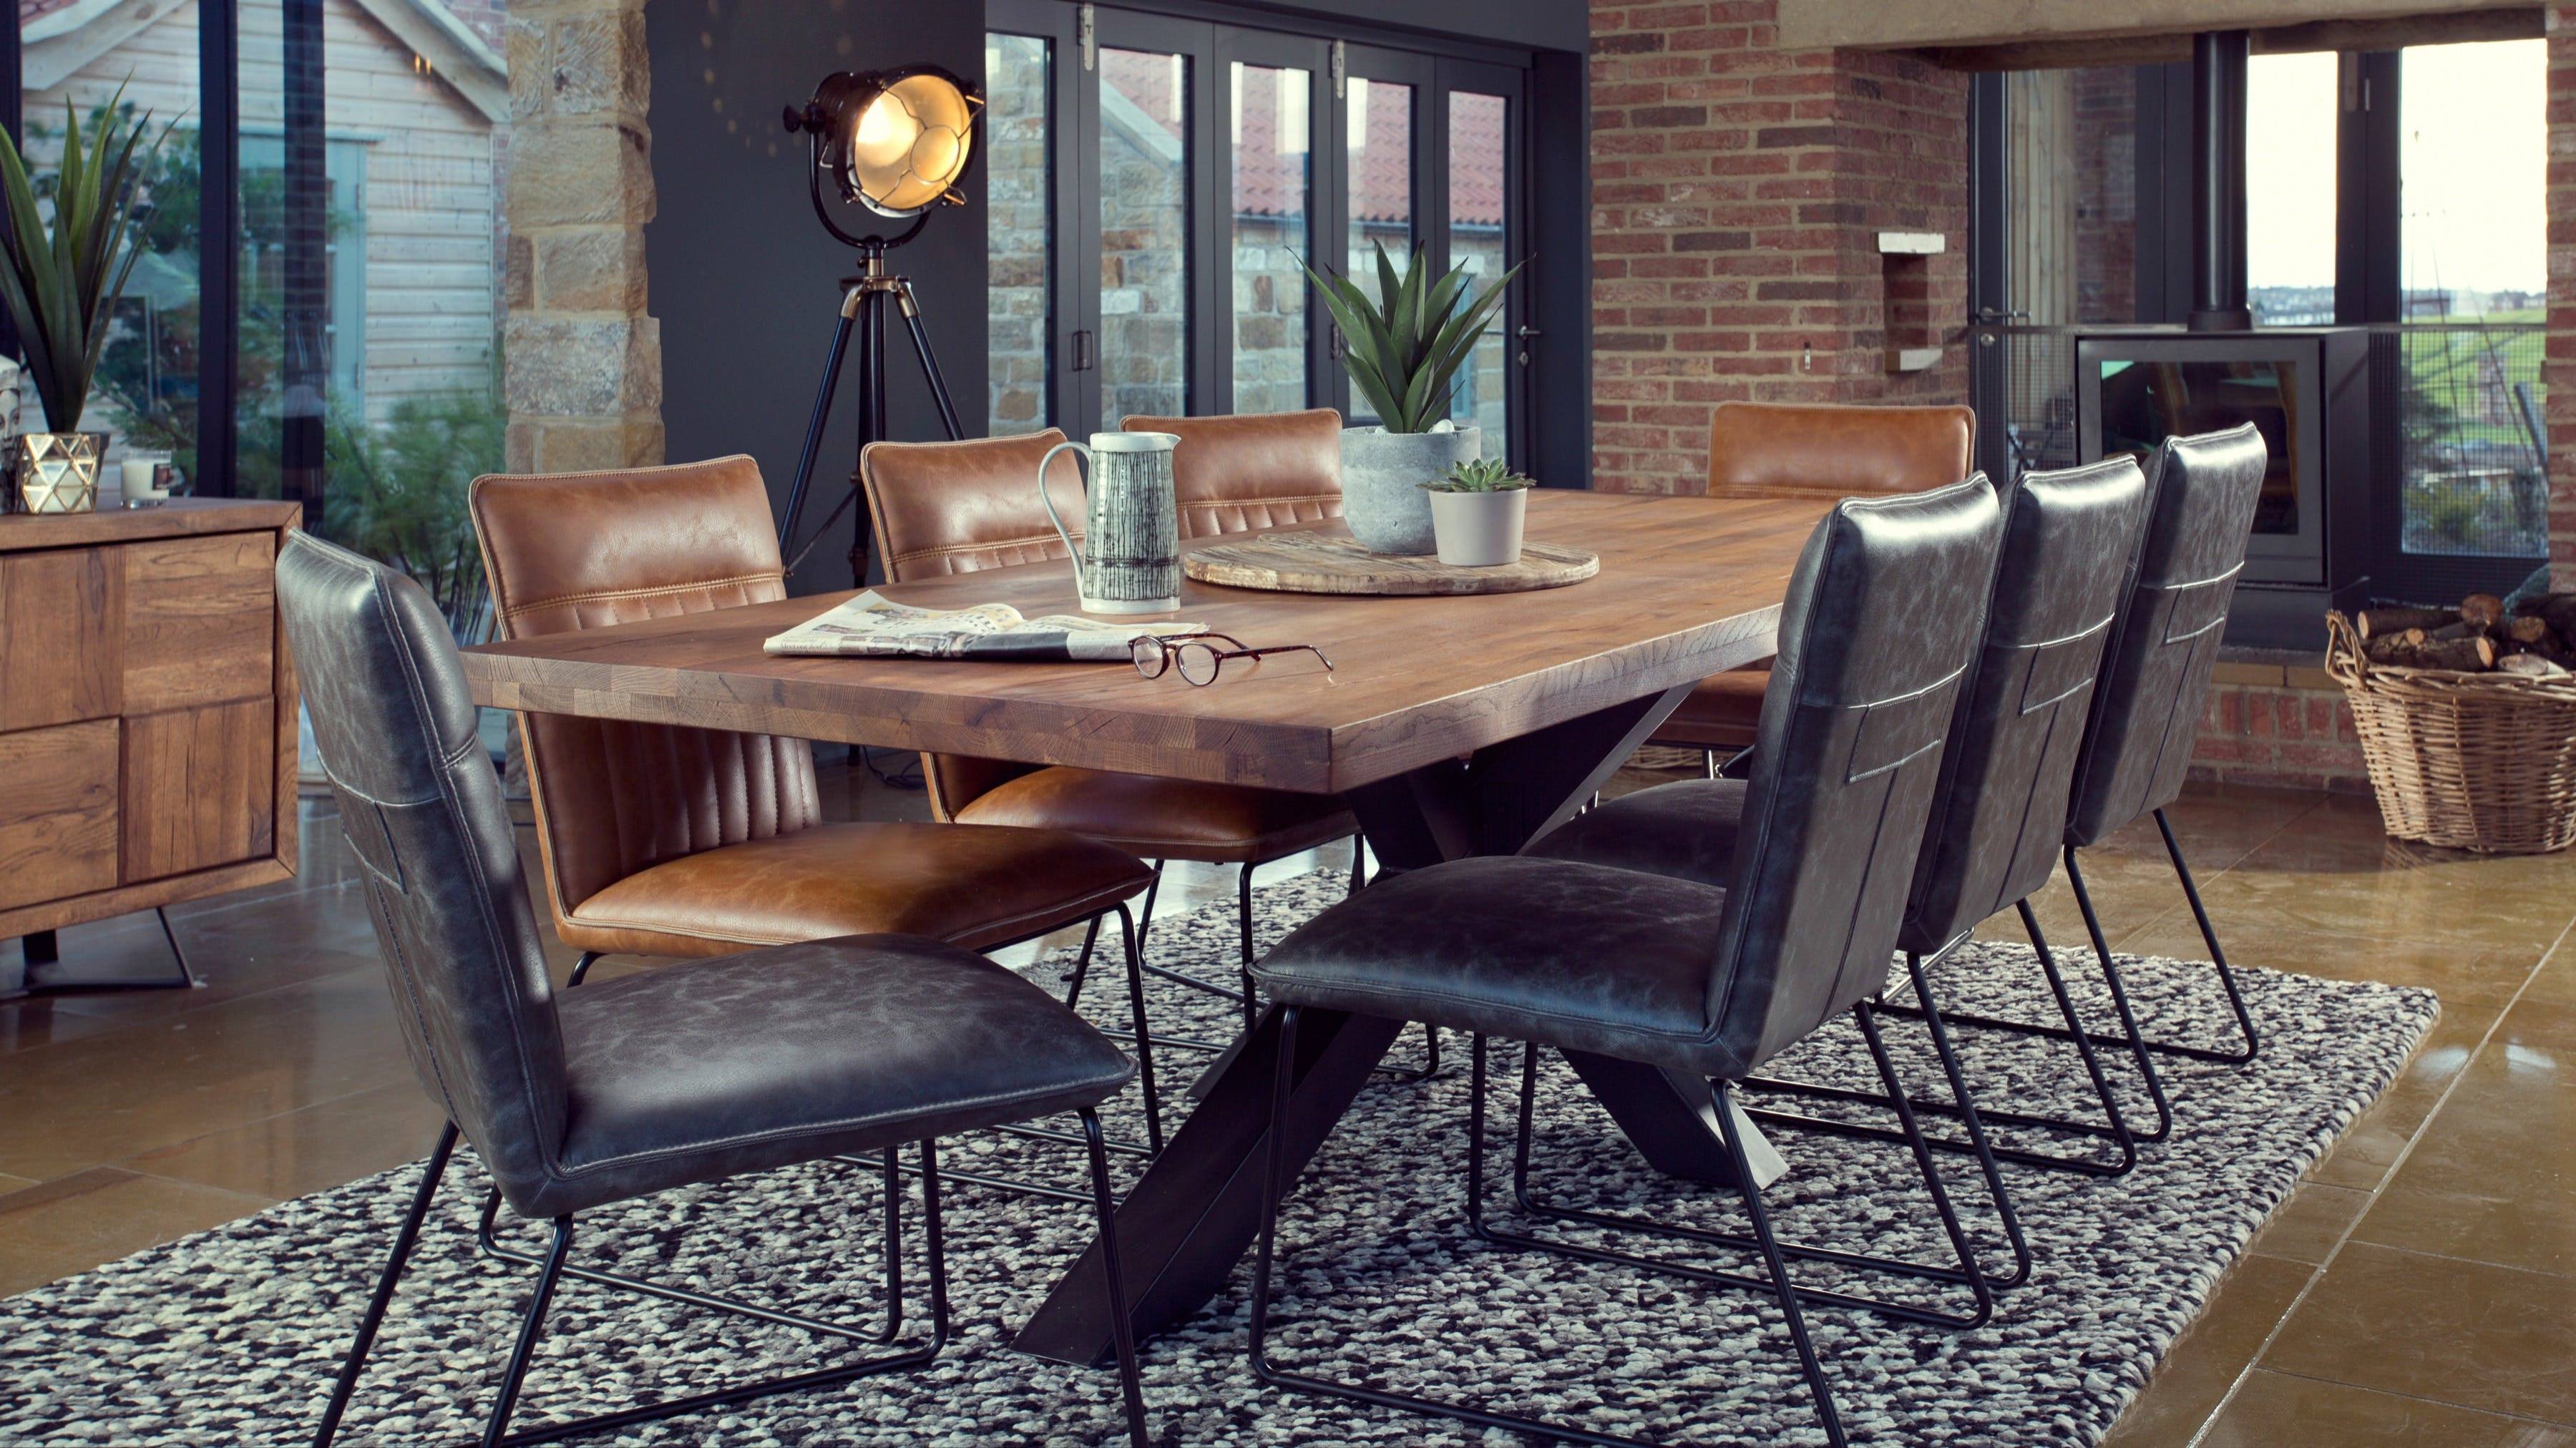 Meubles de salle à manger : table à manger, buffet Meubles de